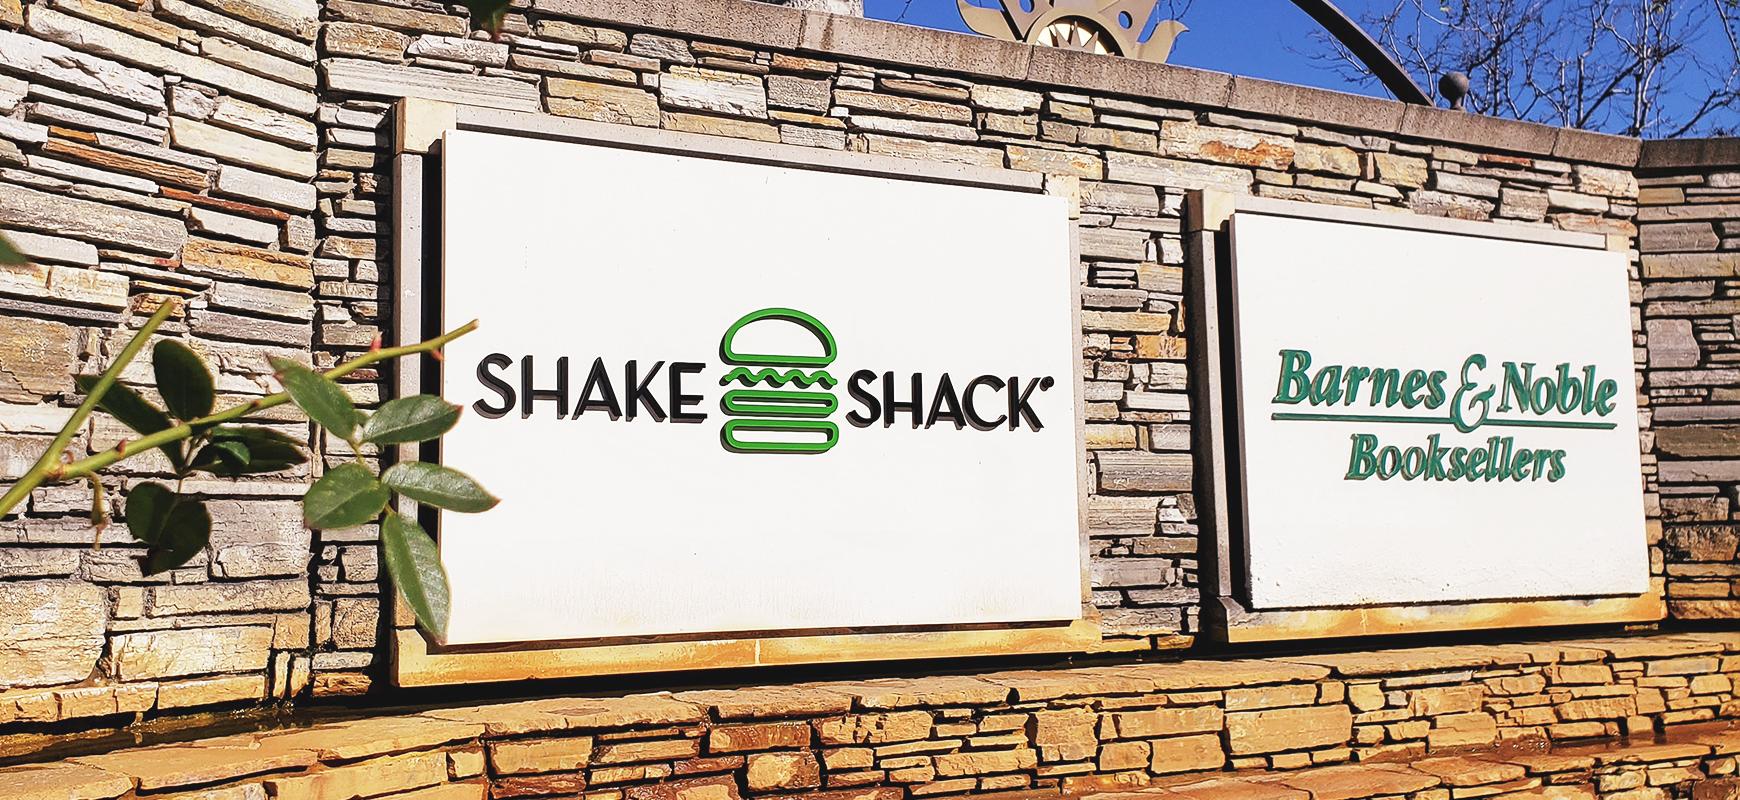 shake-shack-3d-letters